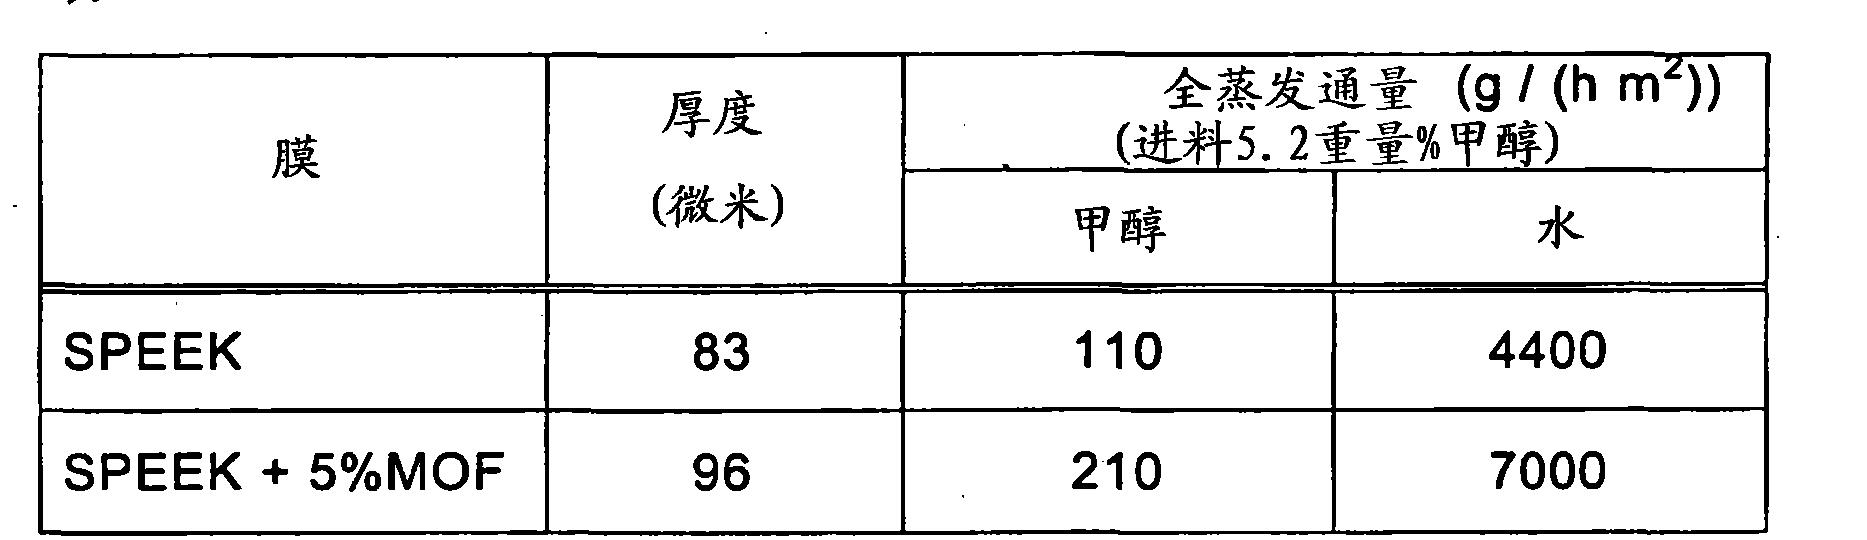 speek,其包含下面结构的重复单元:[0022]5[0023]